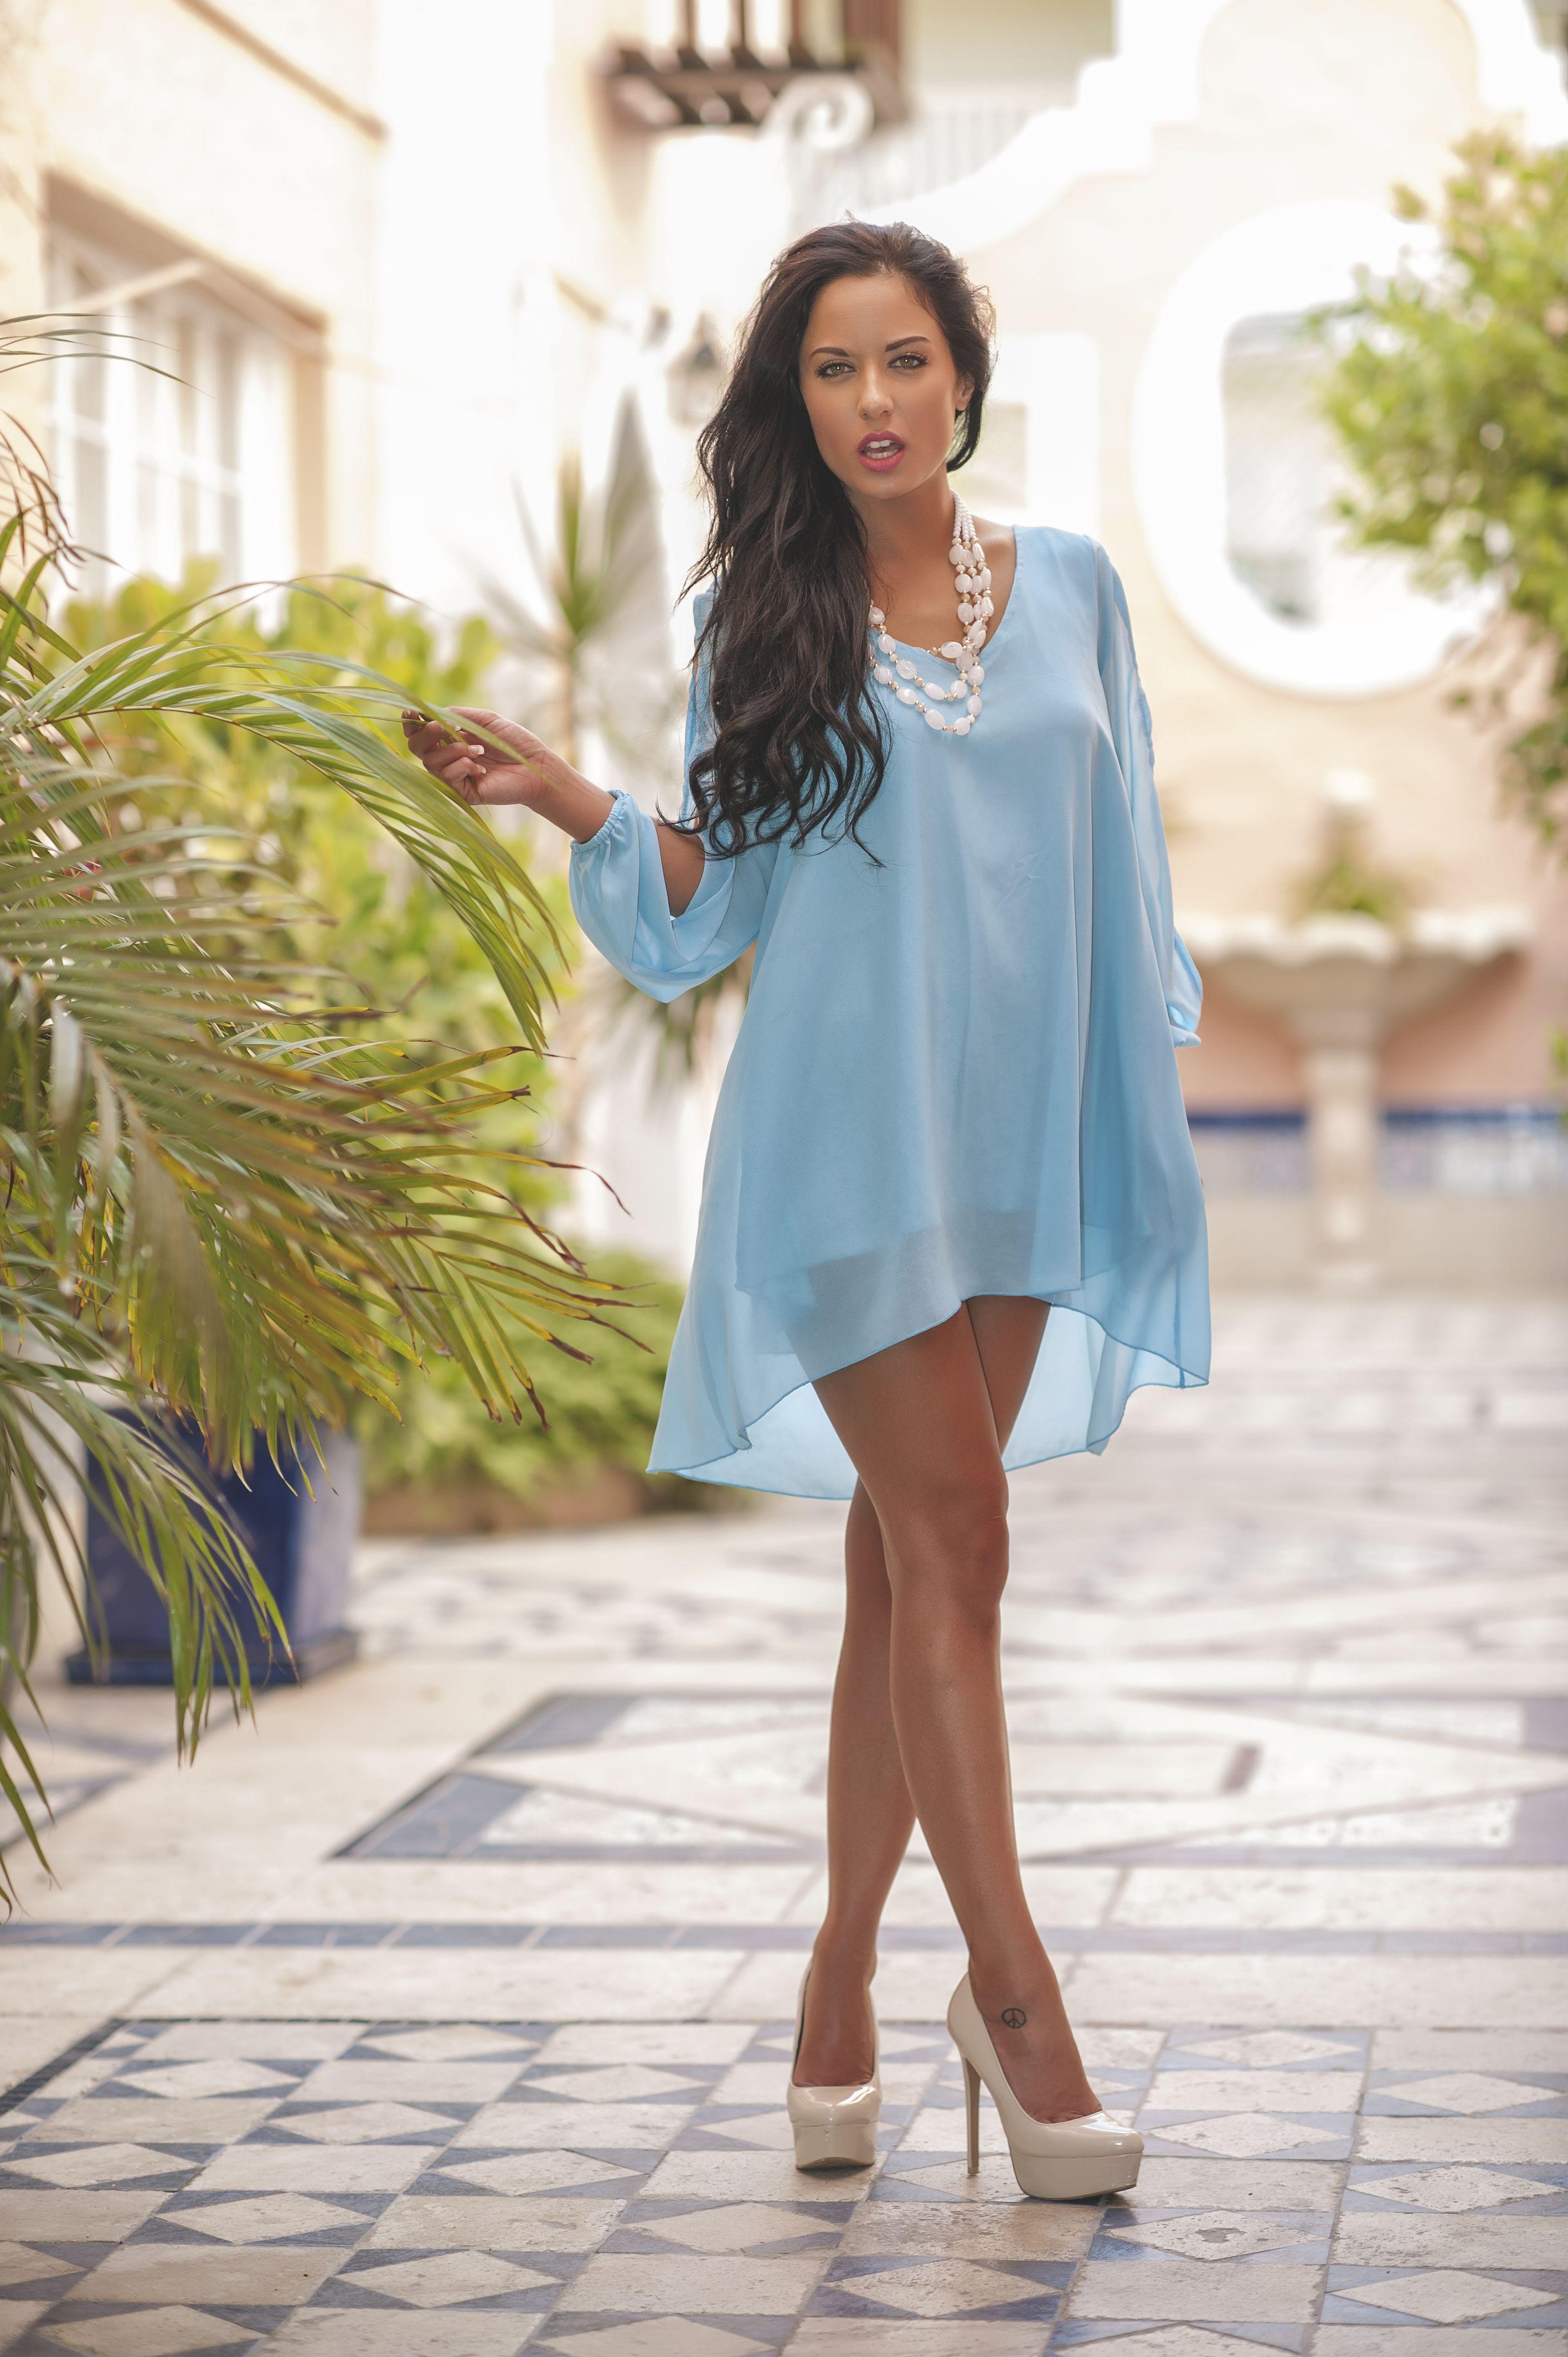 Espanola Way, Miami South Beach: Clothing: WISH APP. #wish #app ...